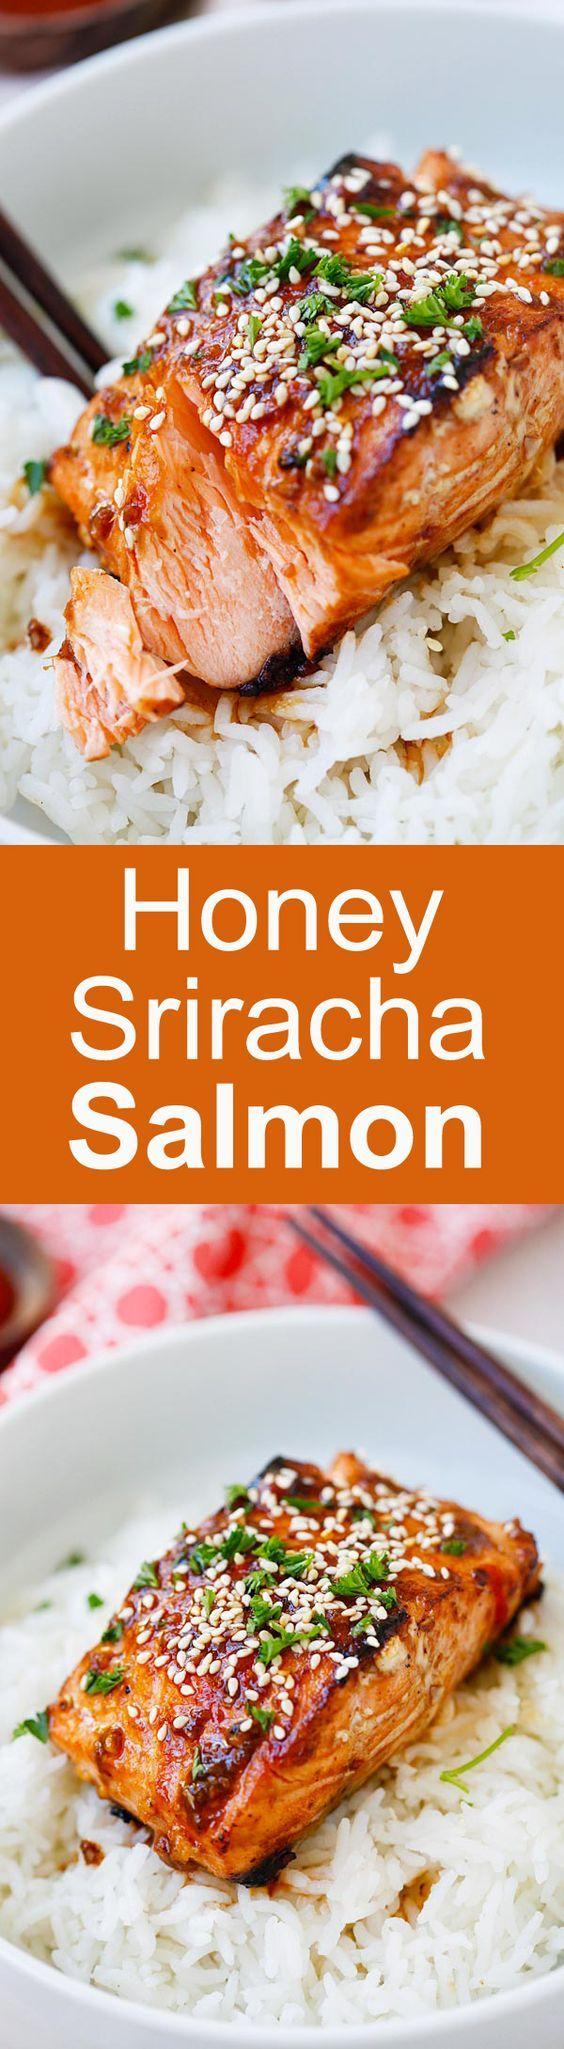 Sriracha Salmon - easy, spicy, sweet, and savory, this glazed salmon ...